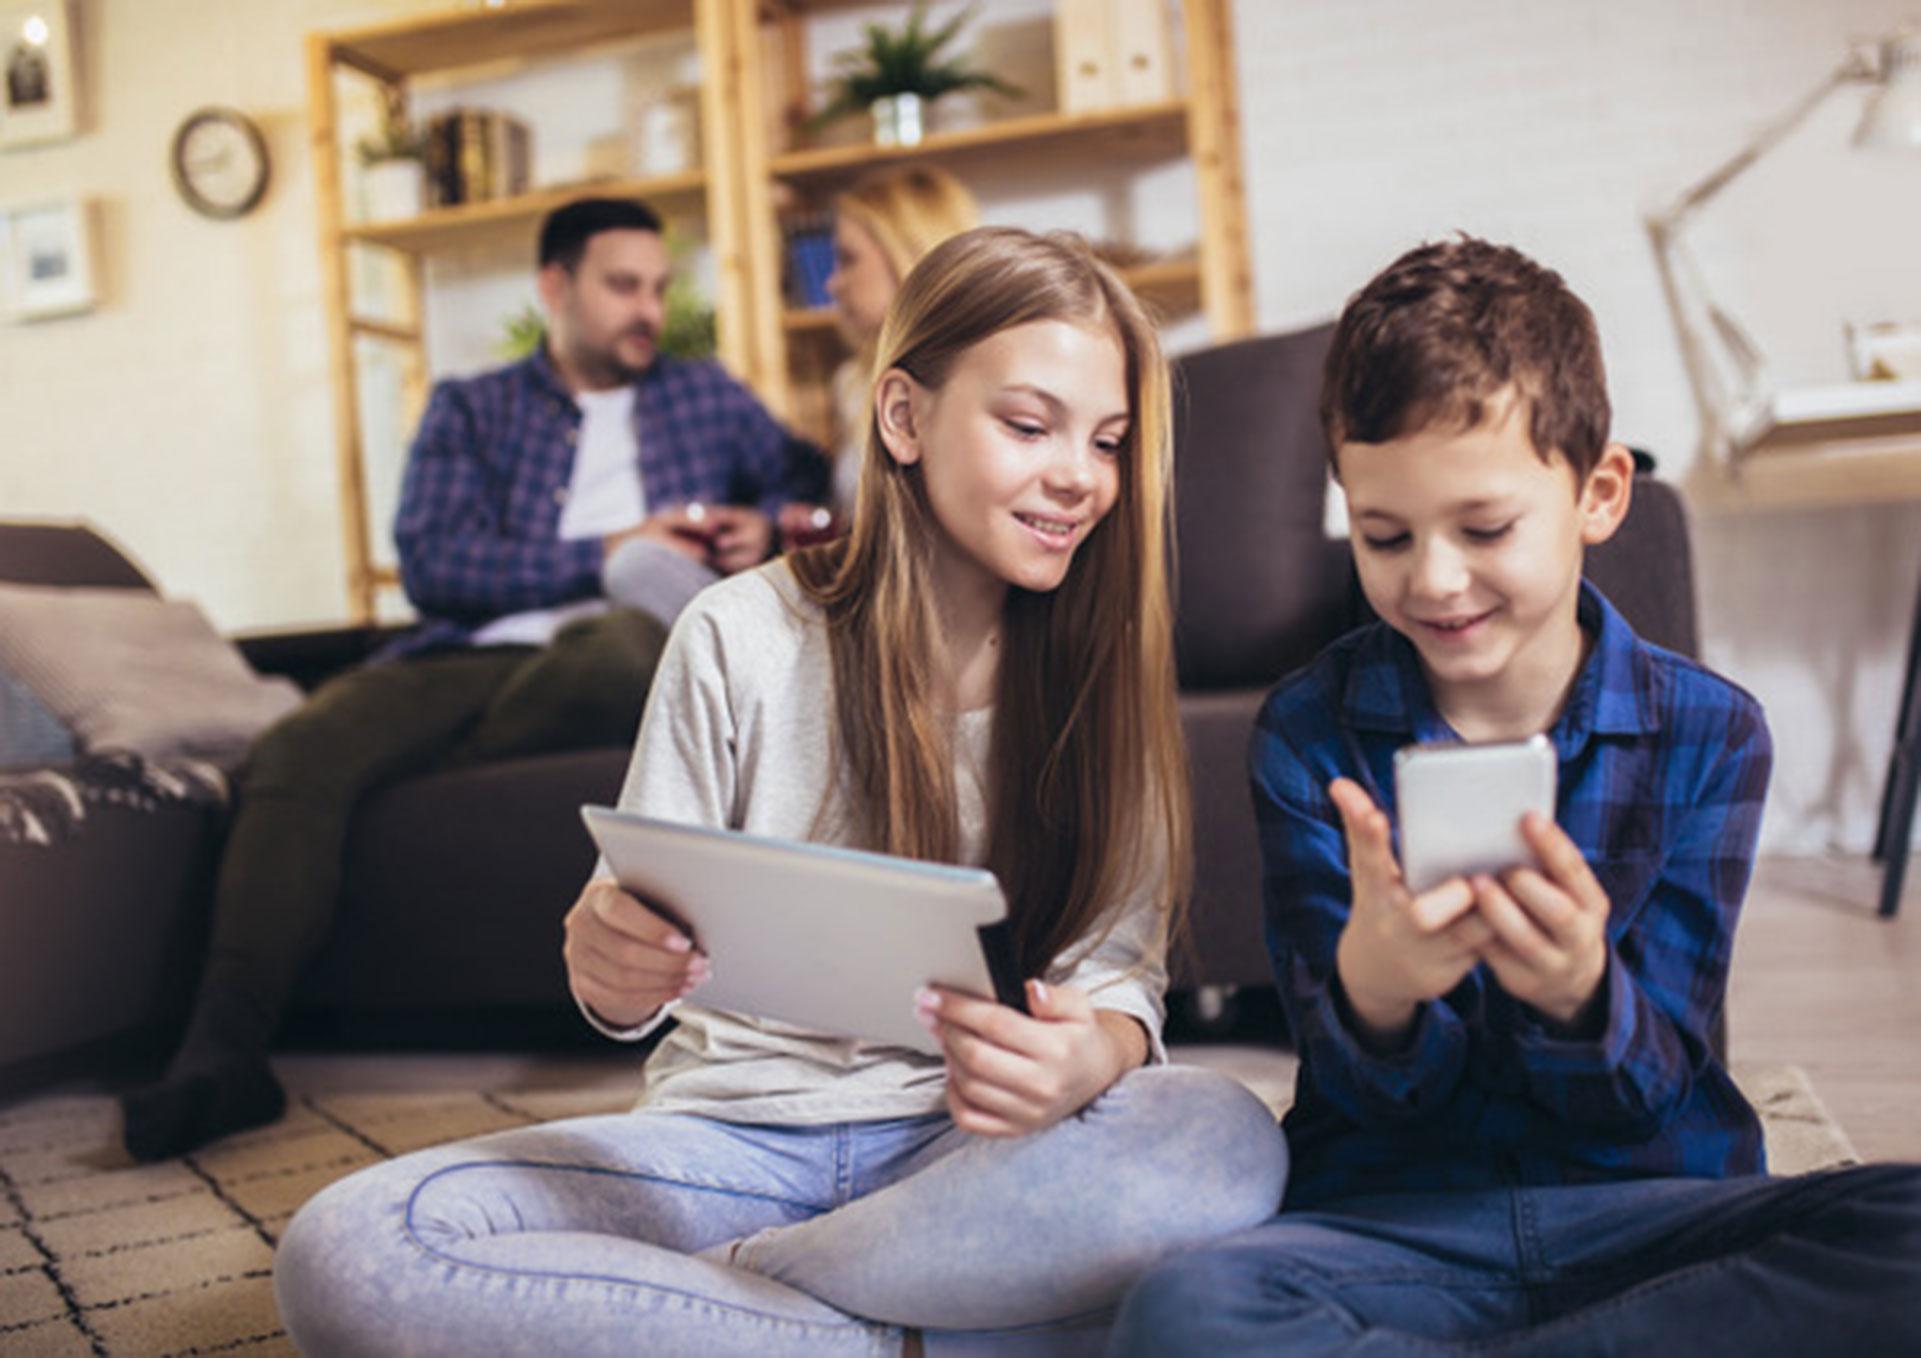 Keeping Kids Safe Online, US News and World Report, April 2020